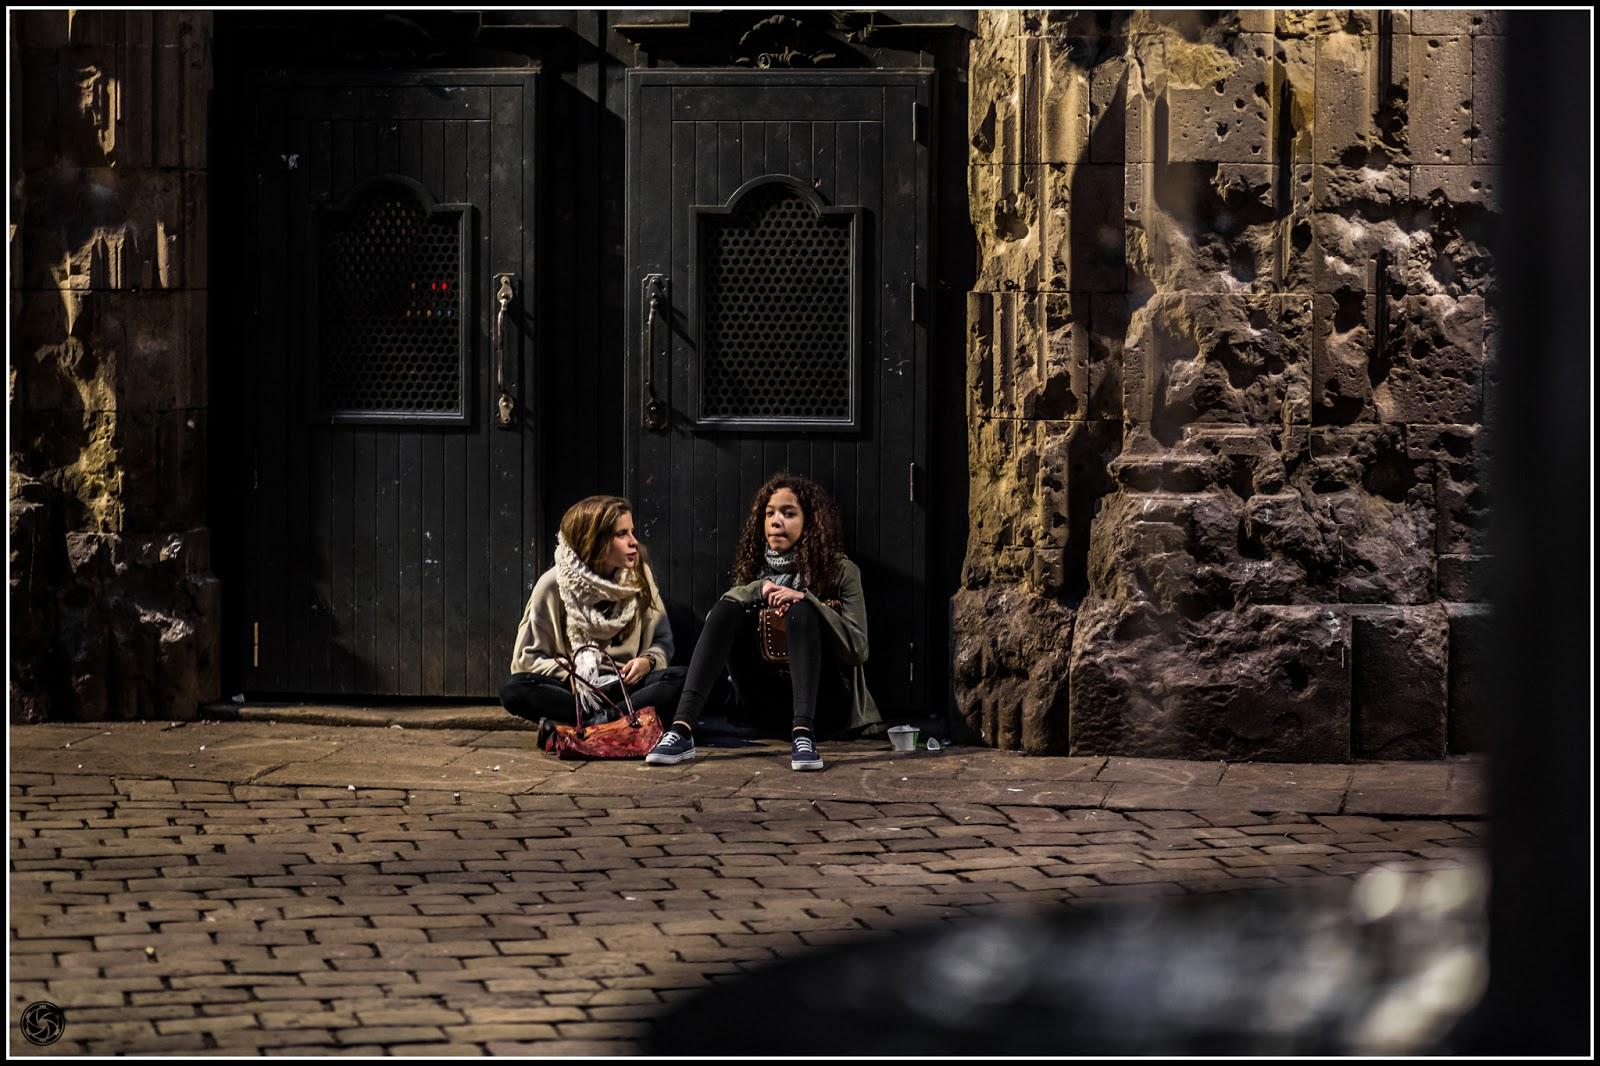 Barcelona, Las Crónicas de Neri: Rincón de confabuladas